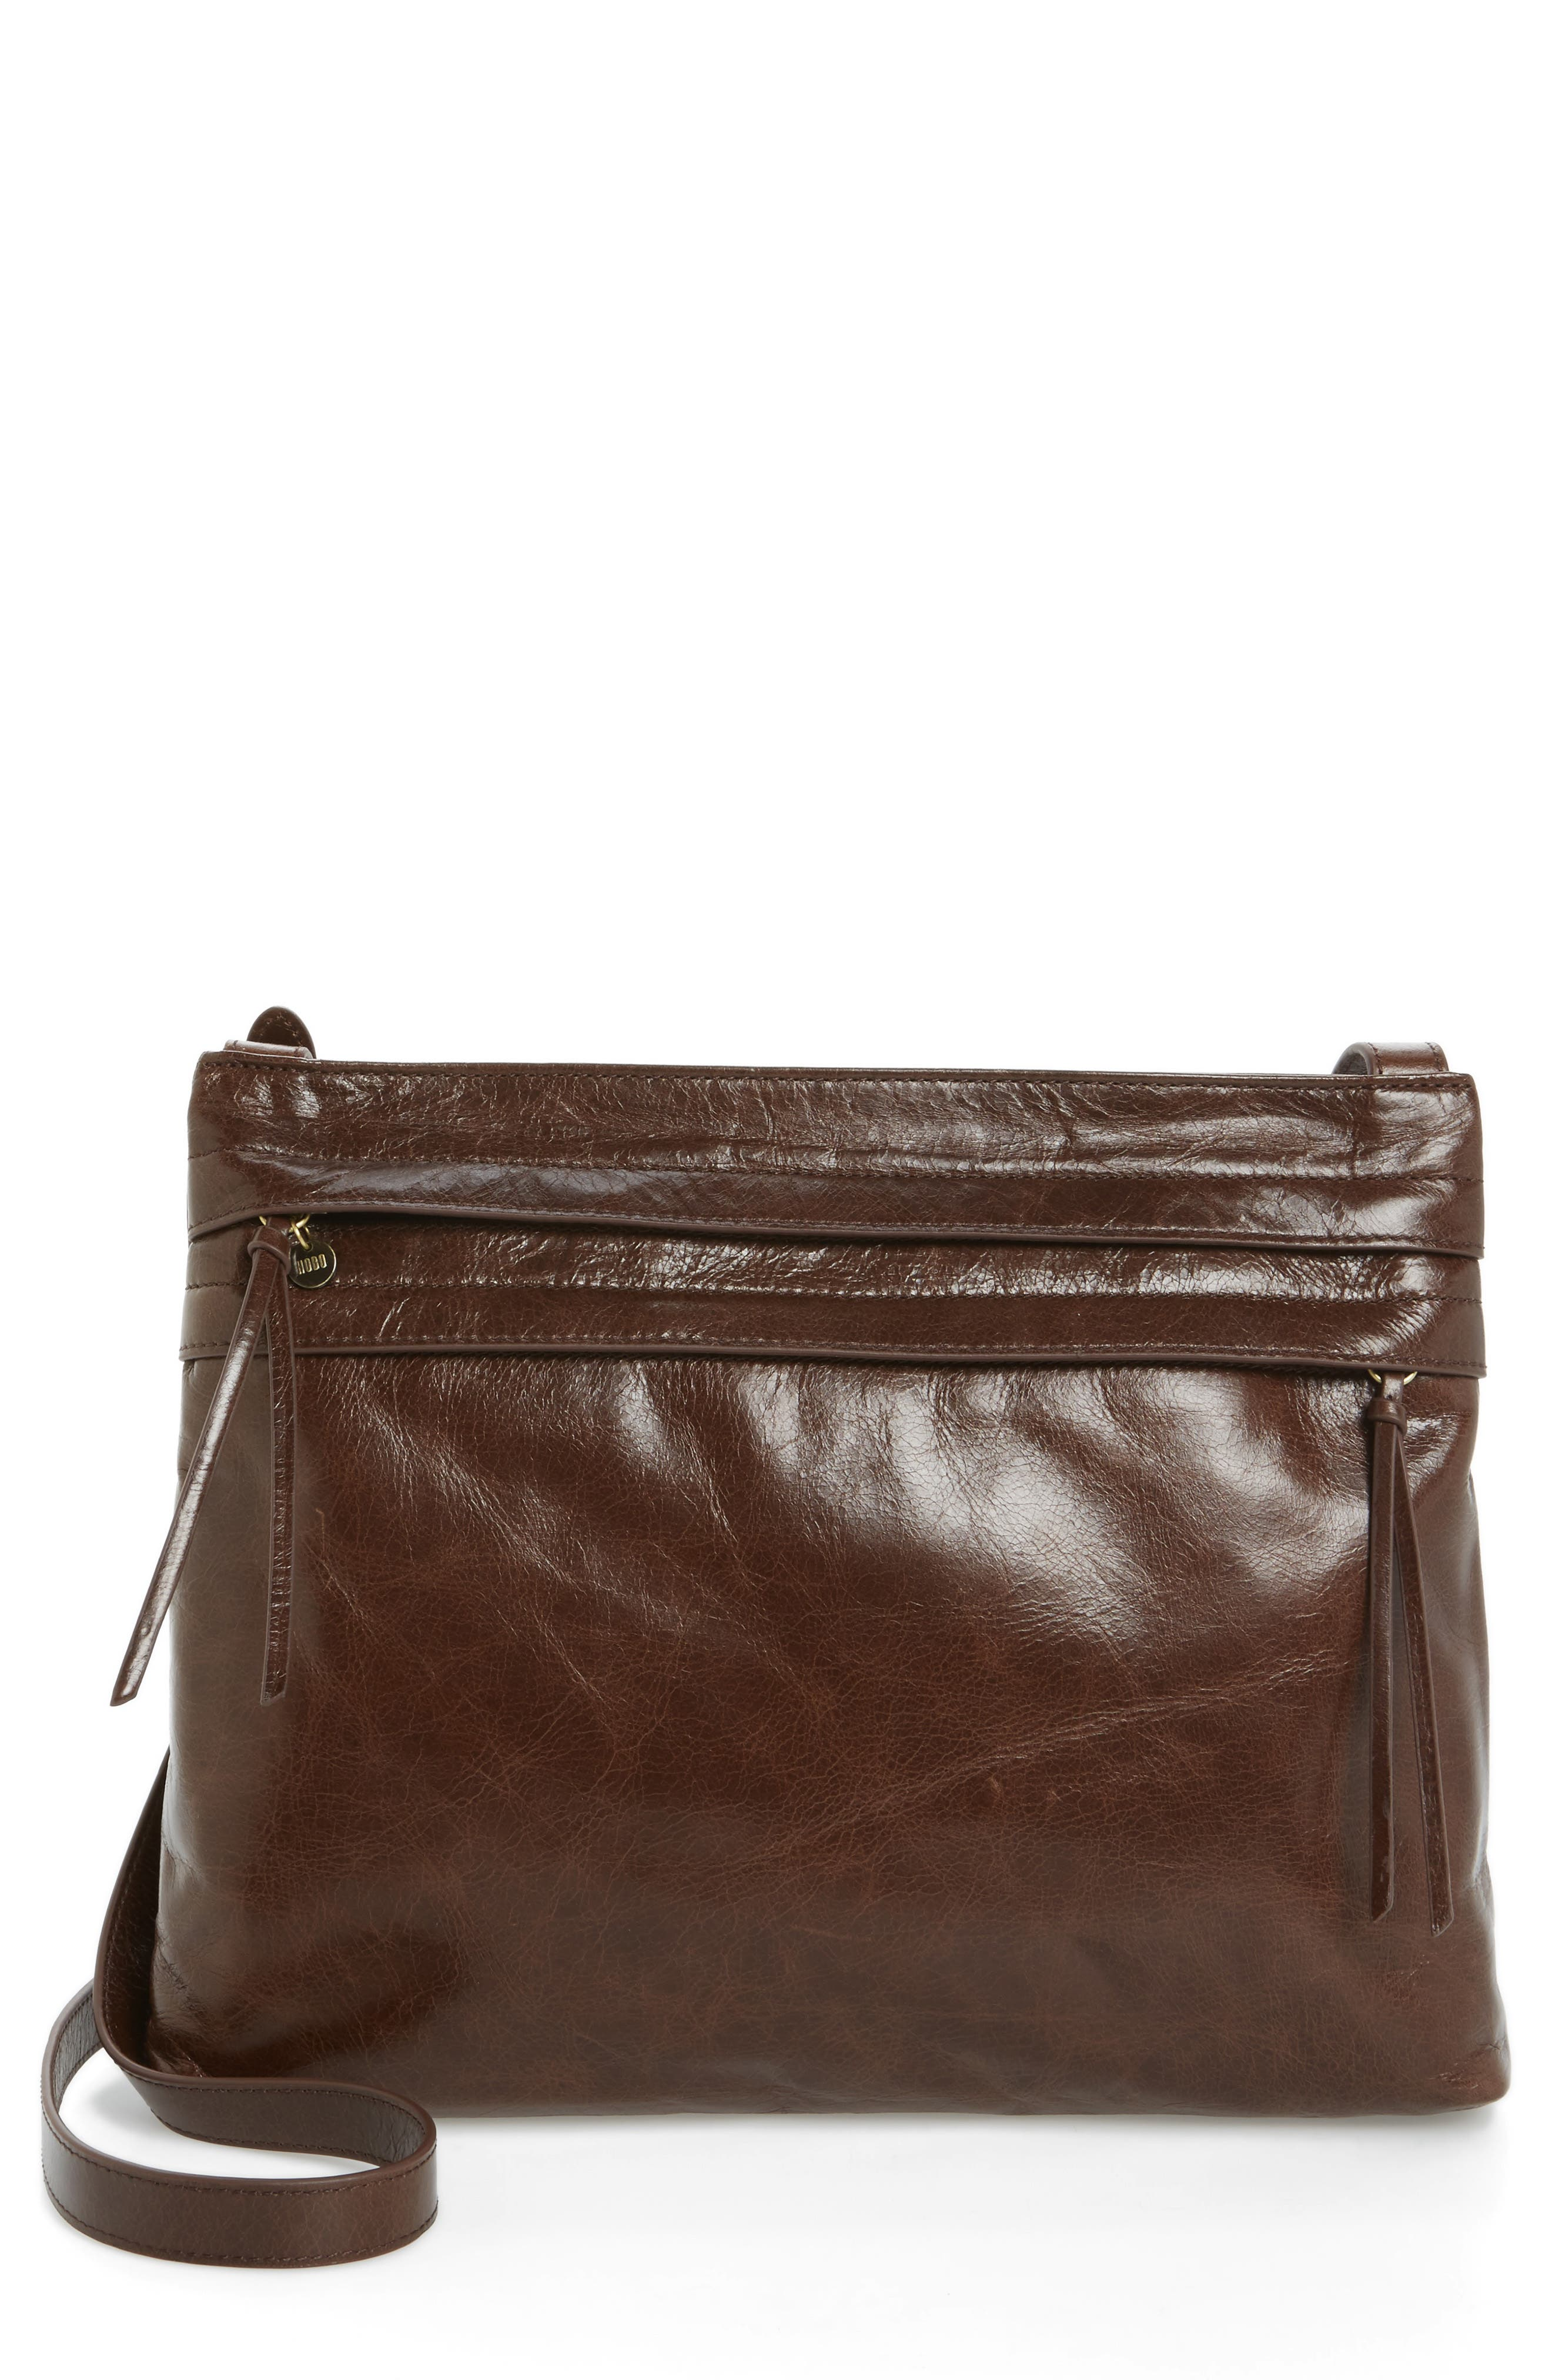 Alternate Image 1 Selected - Hobo Larkin Leather Messenger Bag